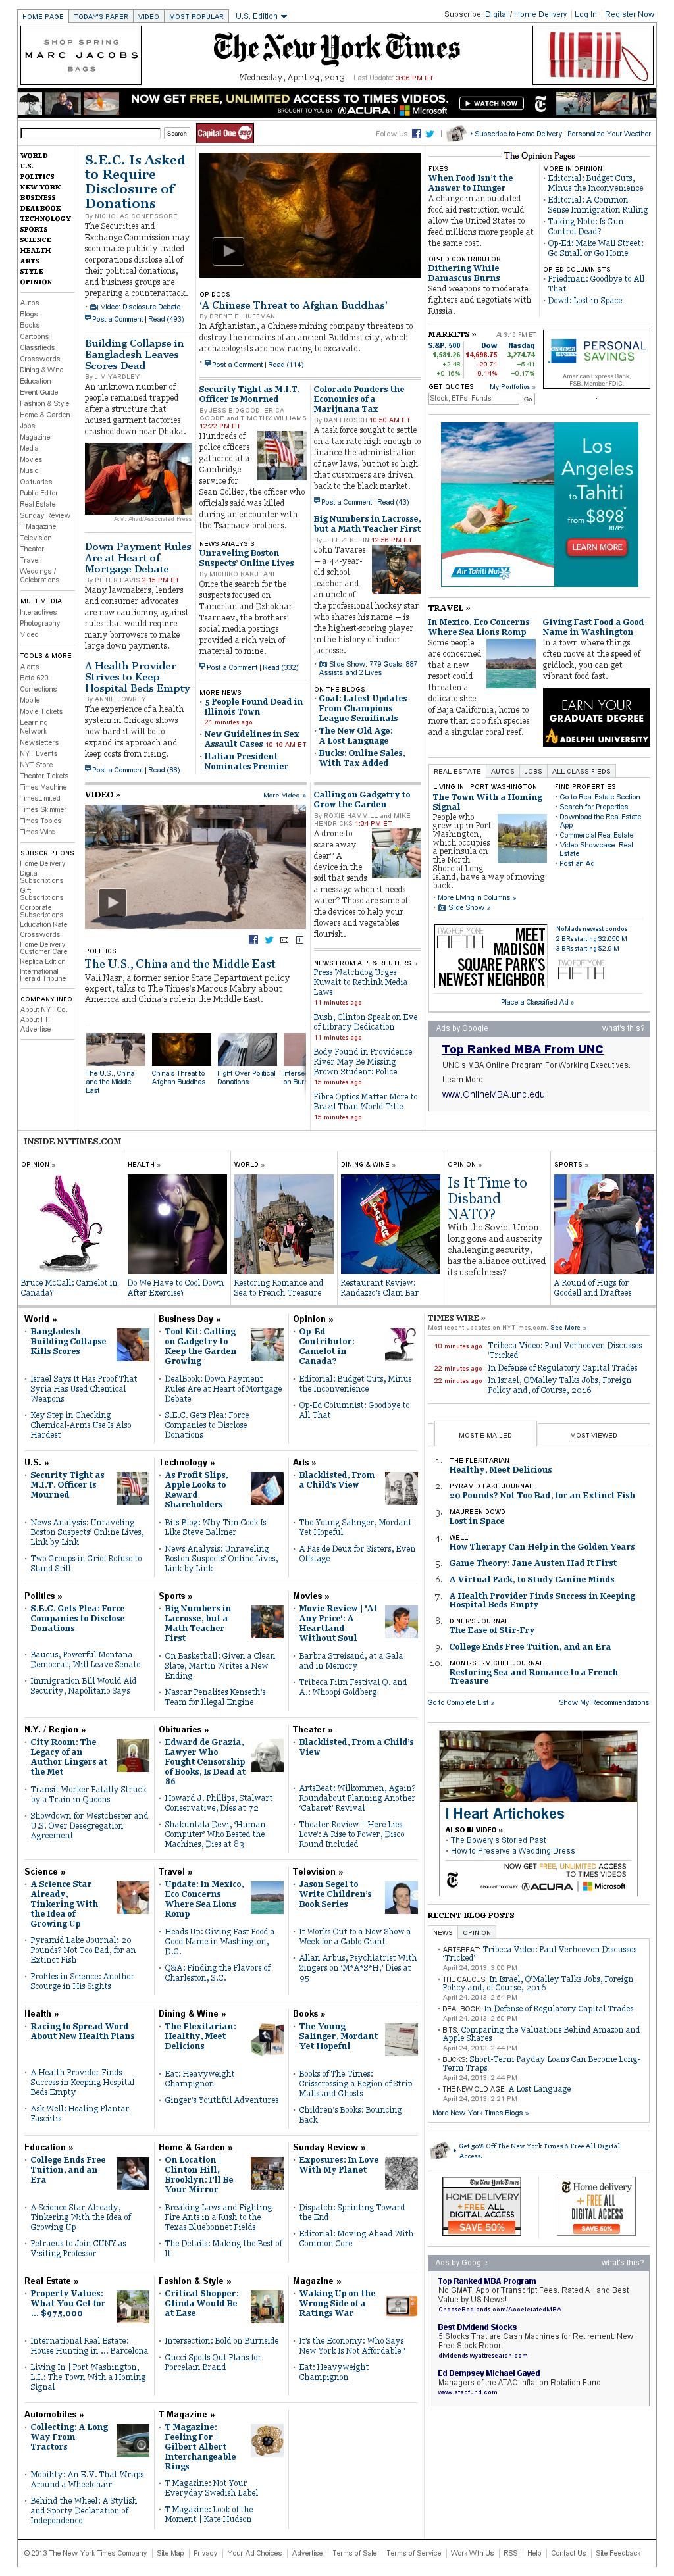 The New York Times at Wednesday April 24, 2013, 7:17 p.m. UTC